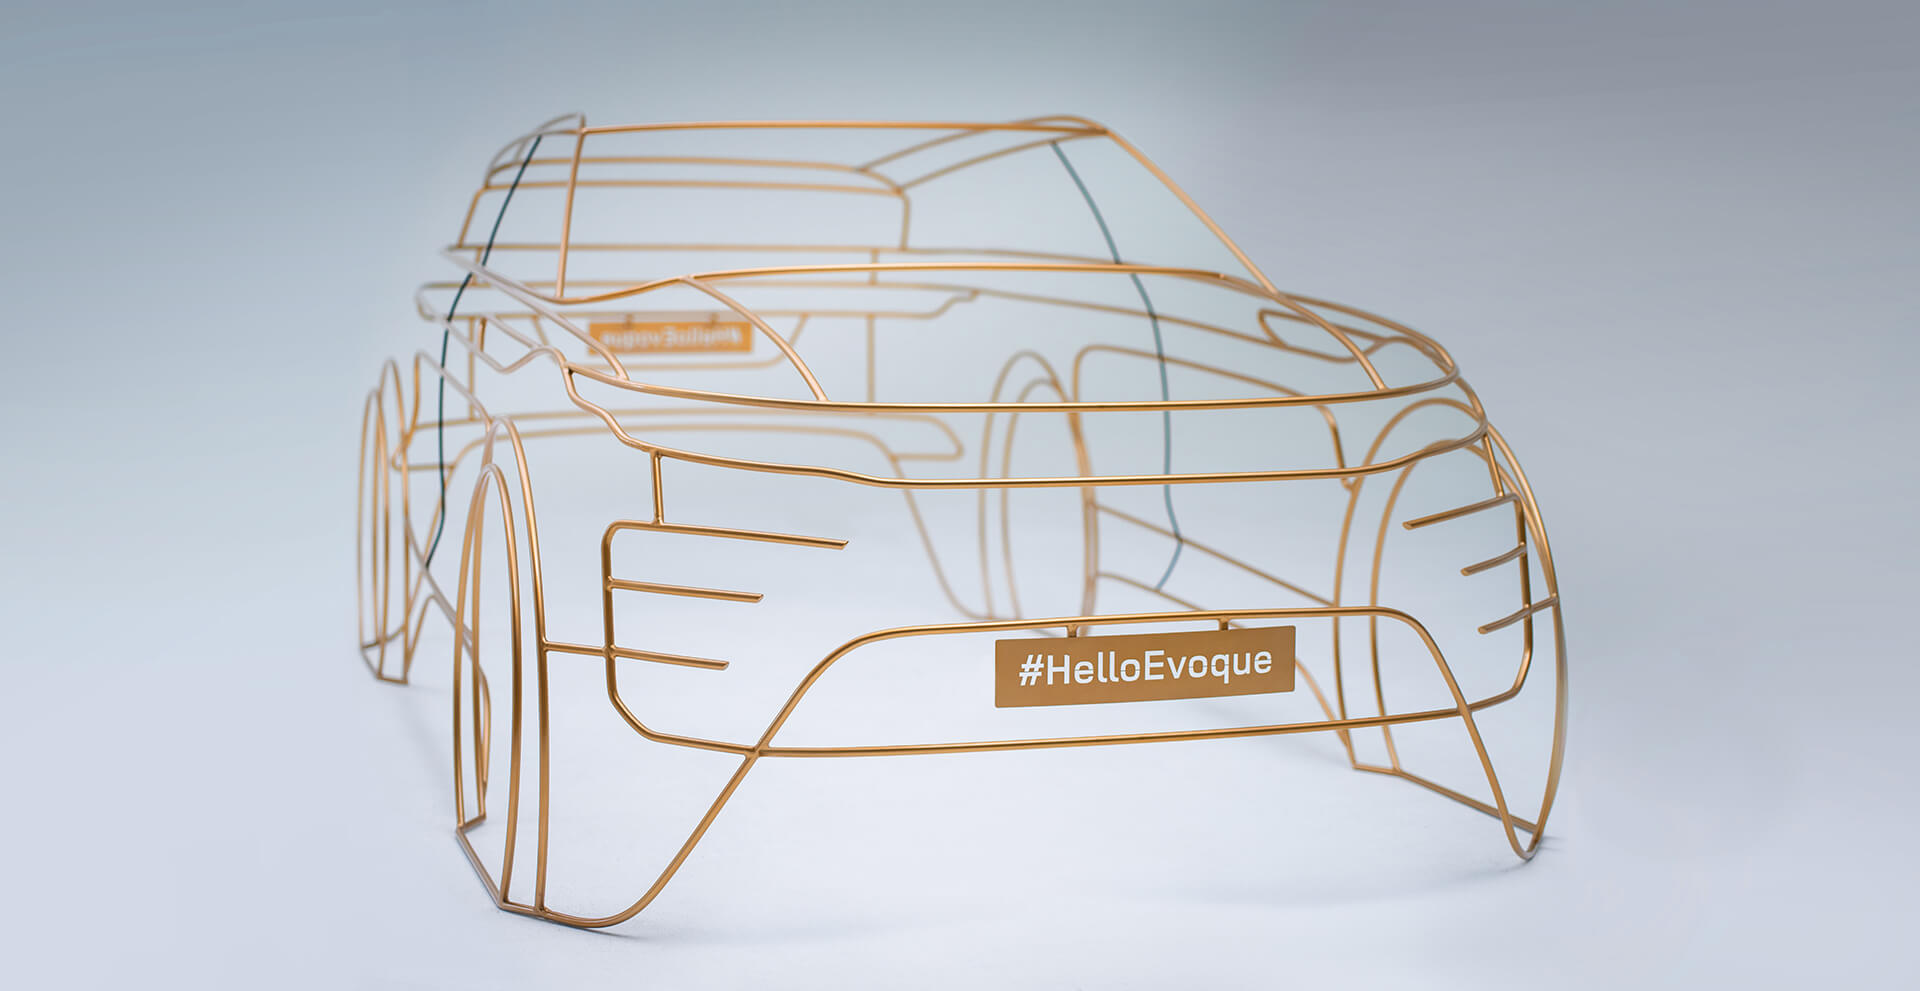 Range Rover Evoque teaser